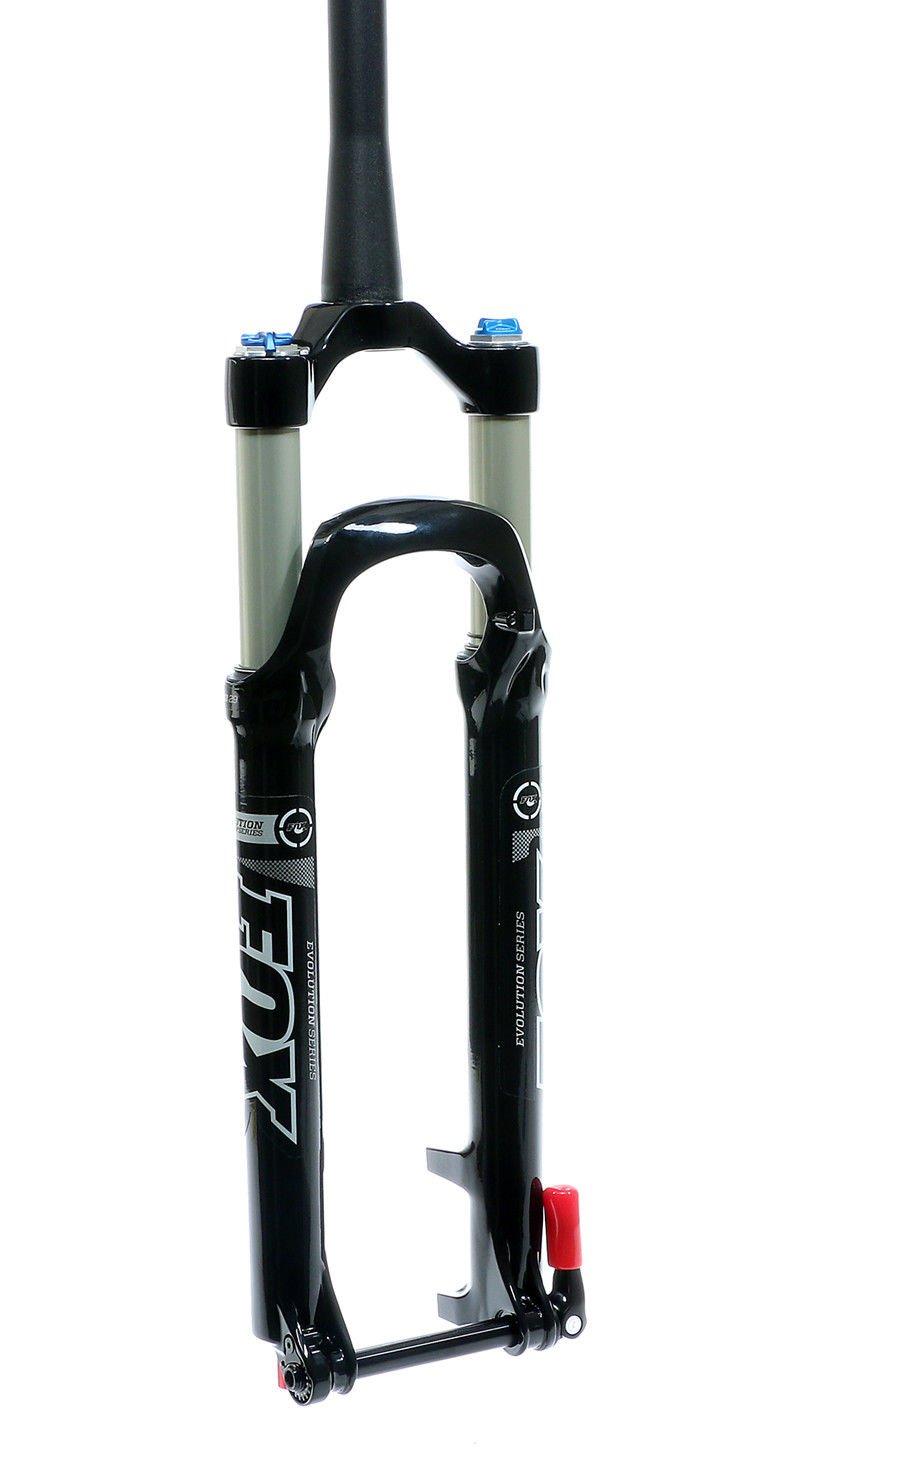 Amazon.com : Fox Float 32 Evolution Series CTD 29er Fork 110mm Travel 1.5  Taper 15QR 2015 : Sports & Outdoors